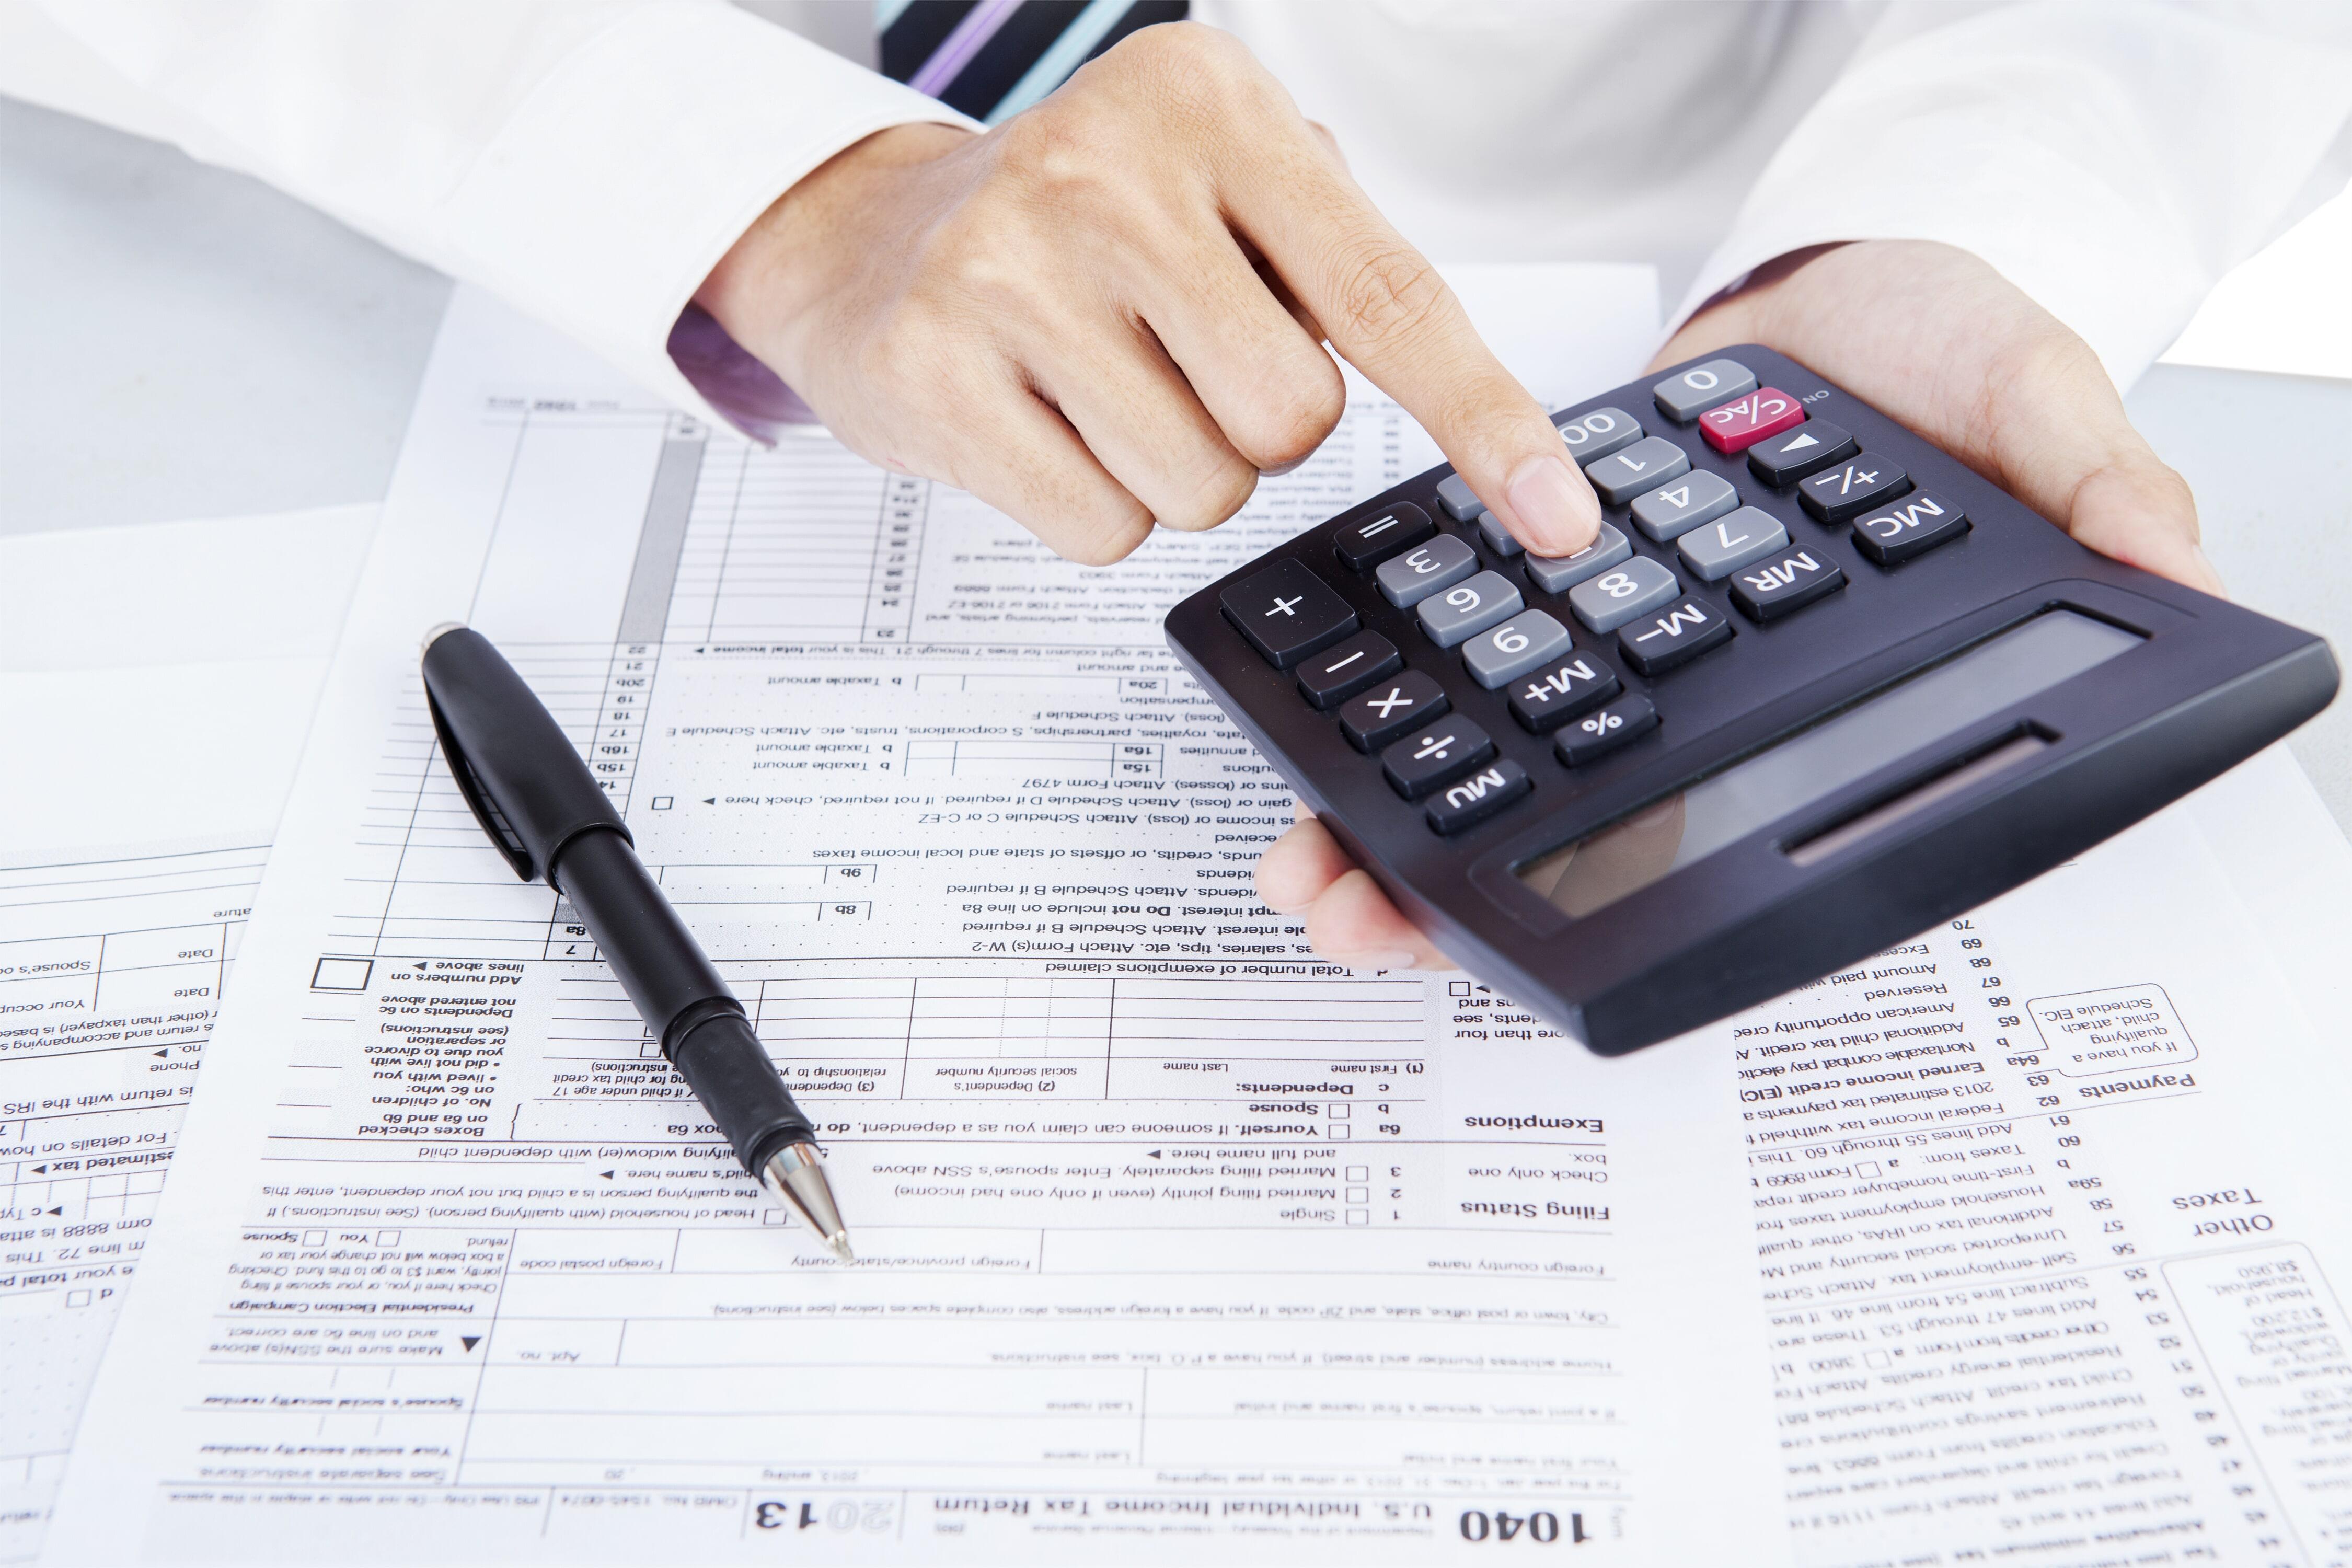 Daňové poradenství - daňový poradce Ing. Josef Šlajs